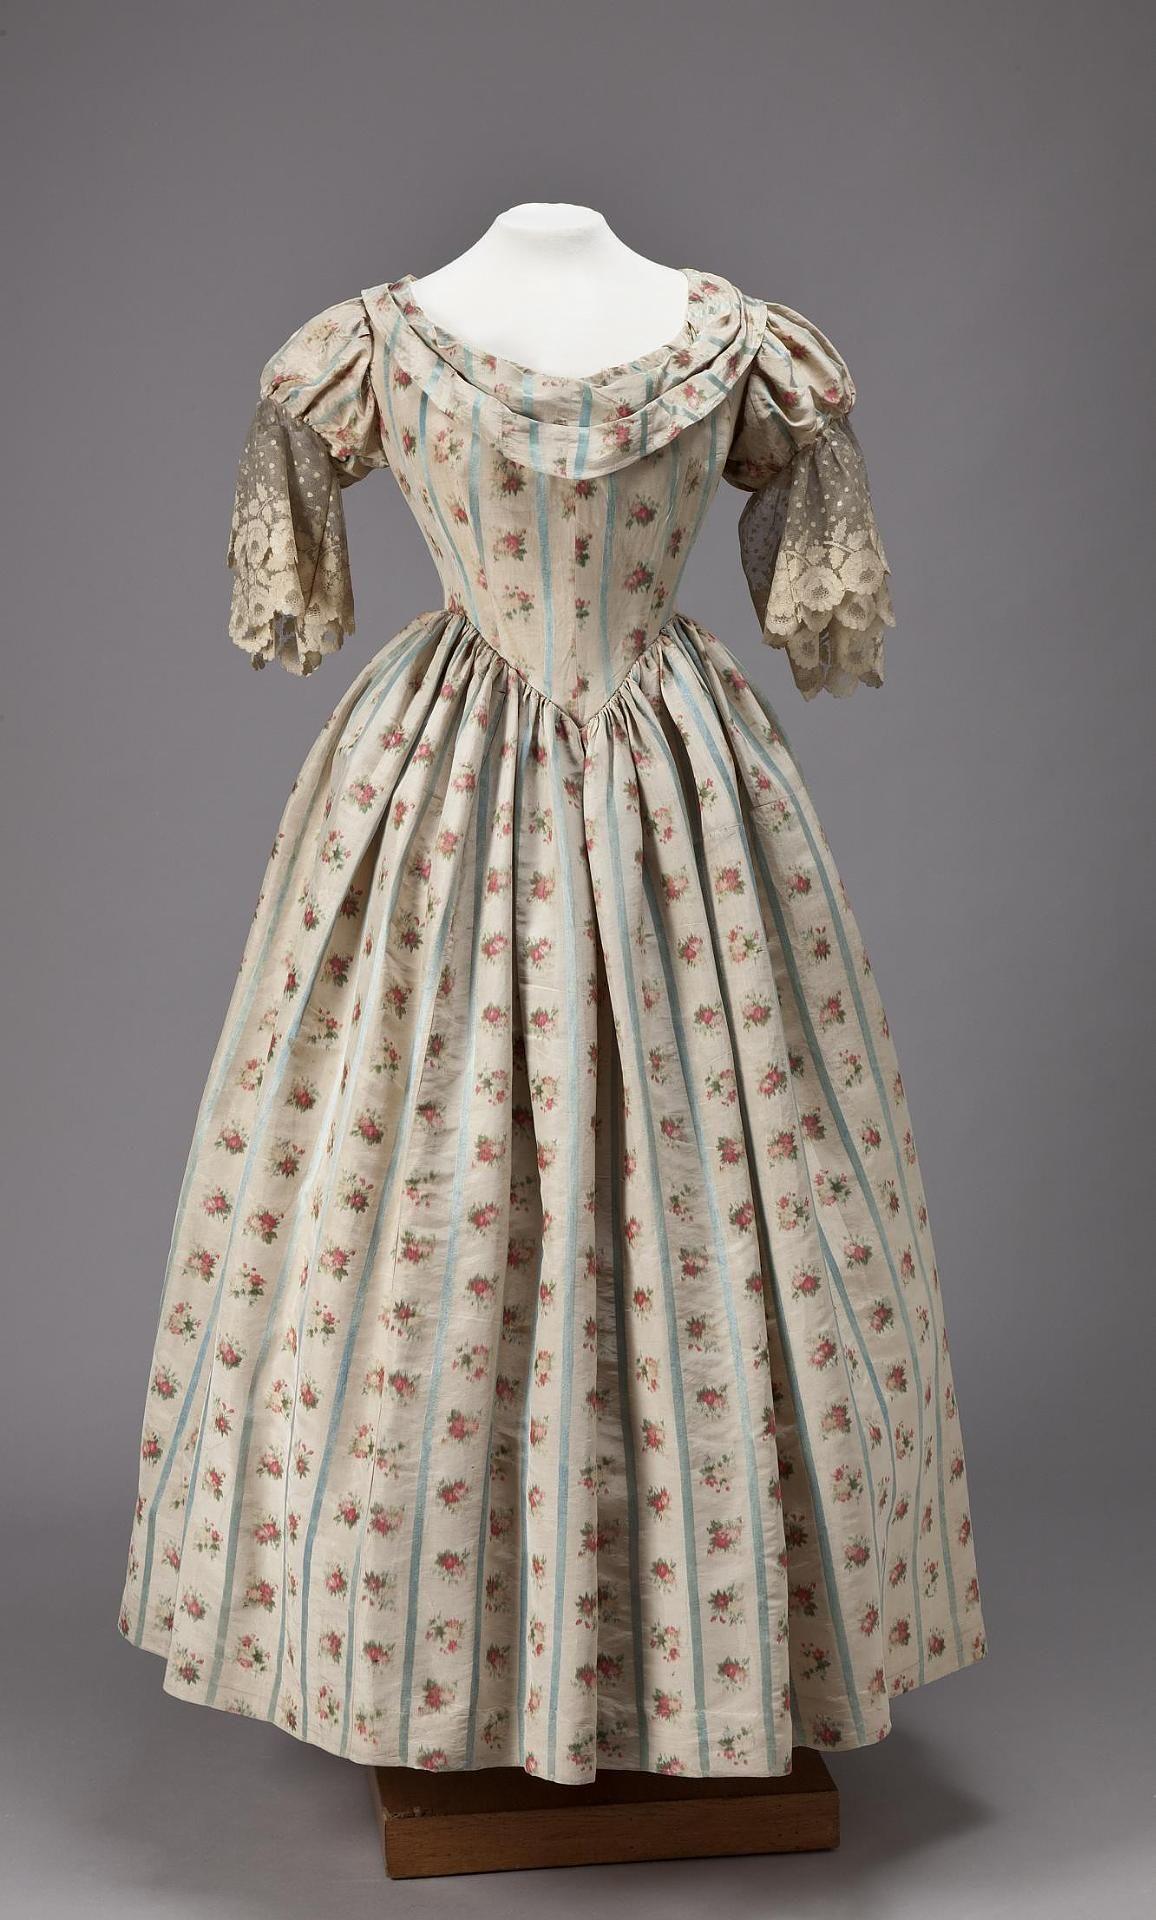 Pin by EmmaDFleming on 1850s History women fashion